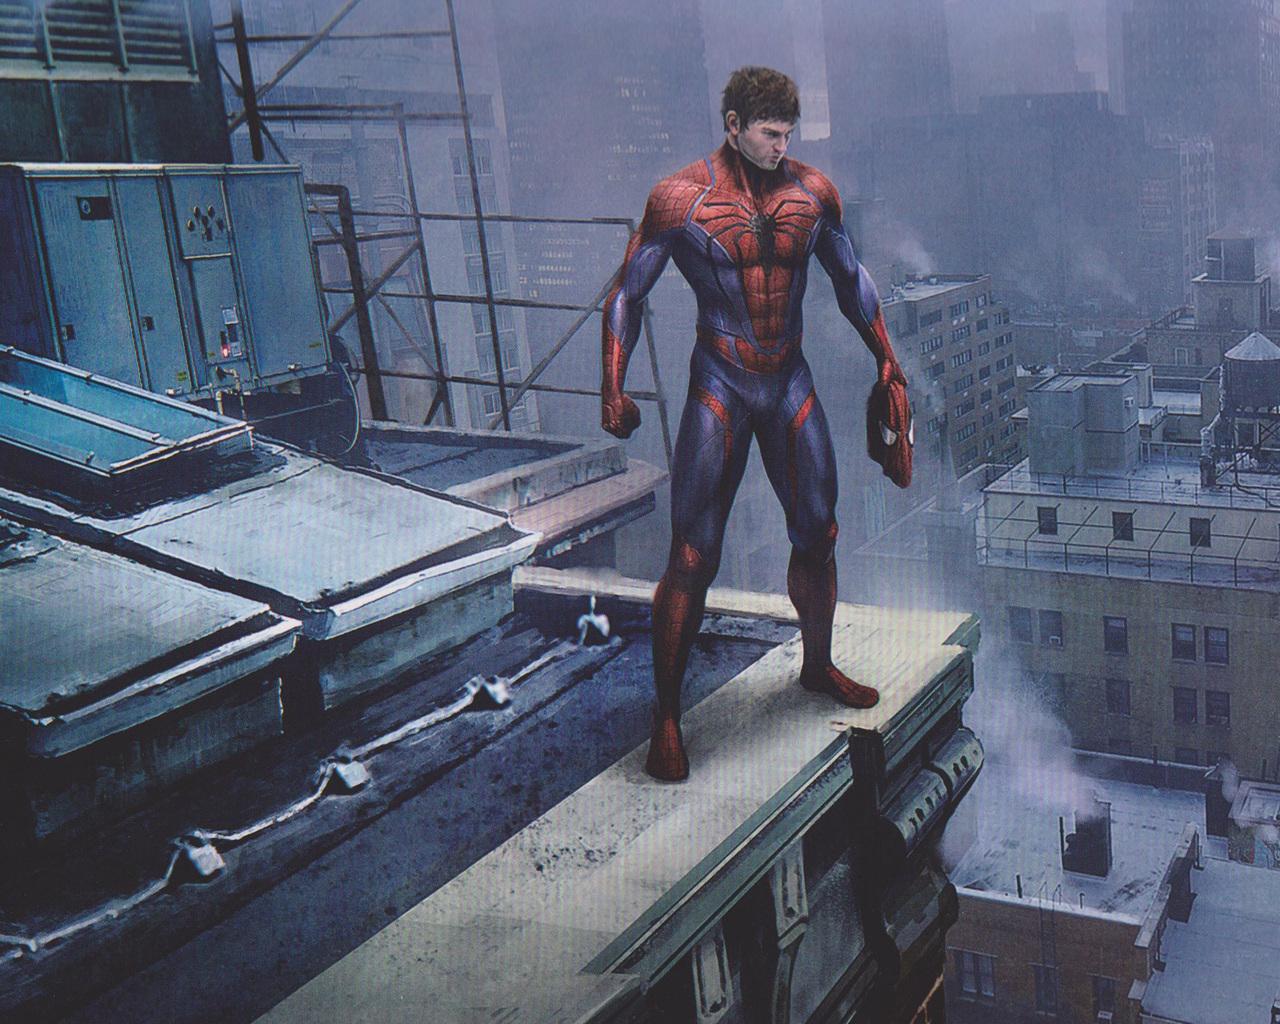 spiderman-peter-parker-standing-on-a-rooftop-ix.jpg